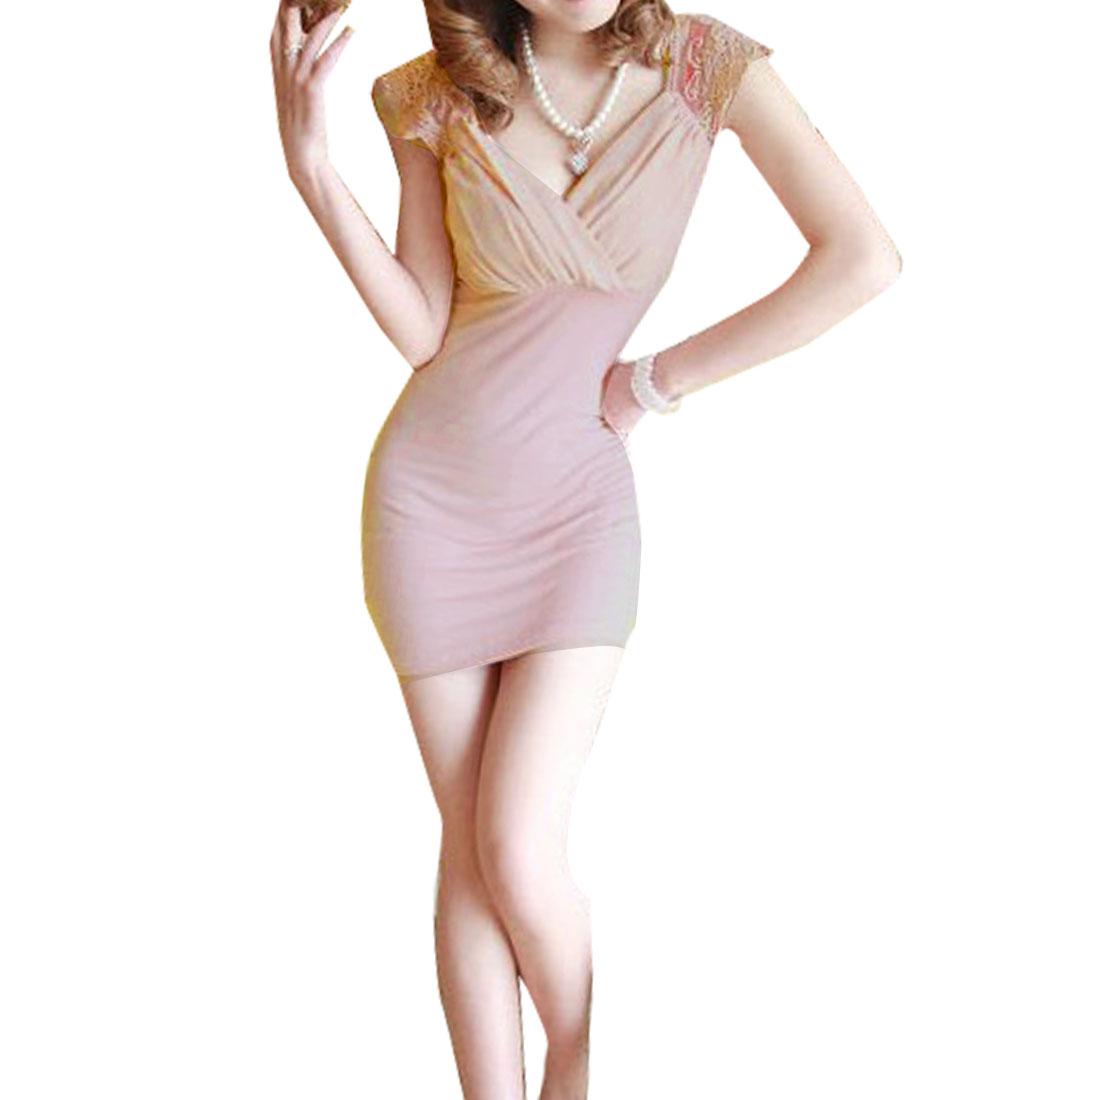 Allegra K Women Embroidering Flower Lace Shoulder Decor Sleeveless Dress Pink XS